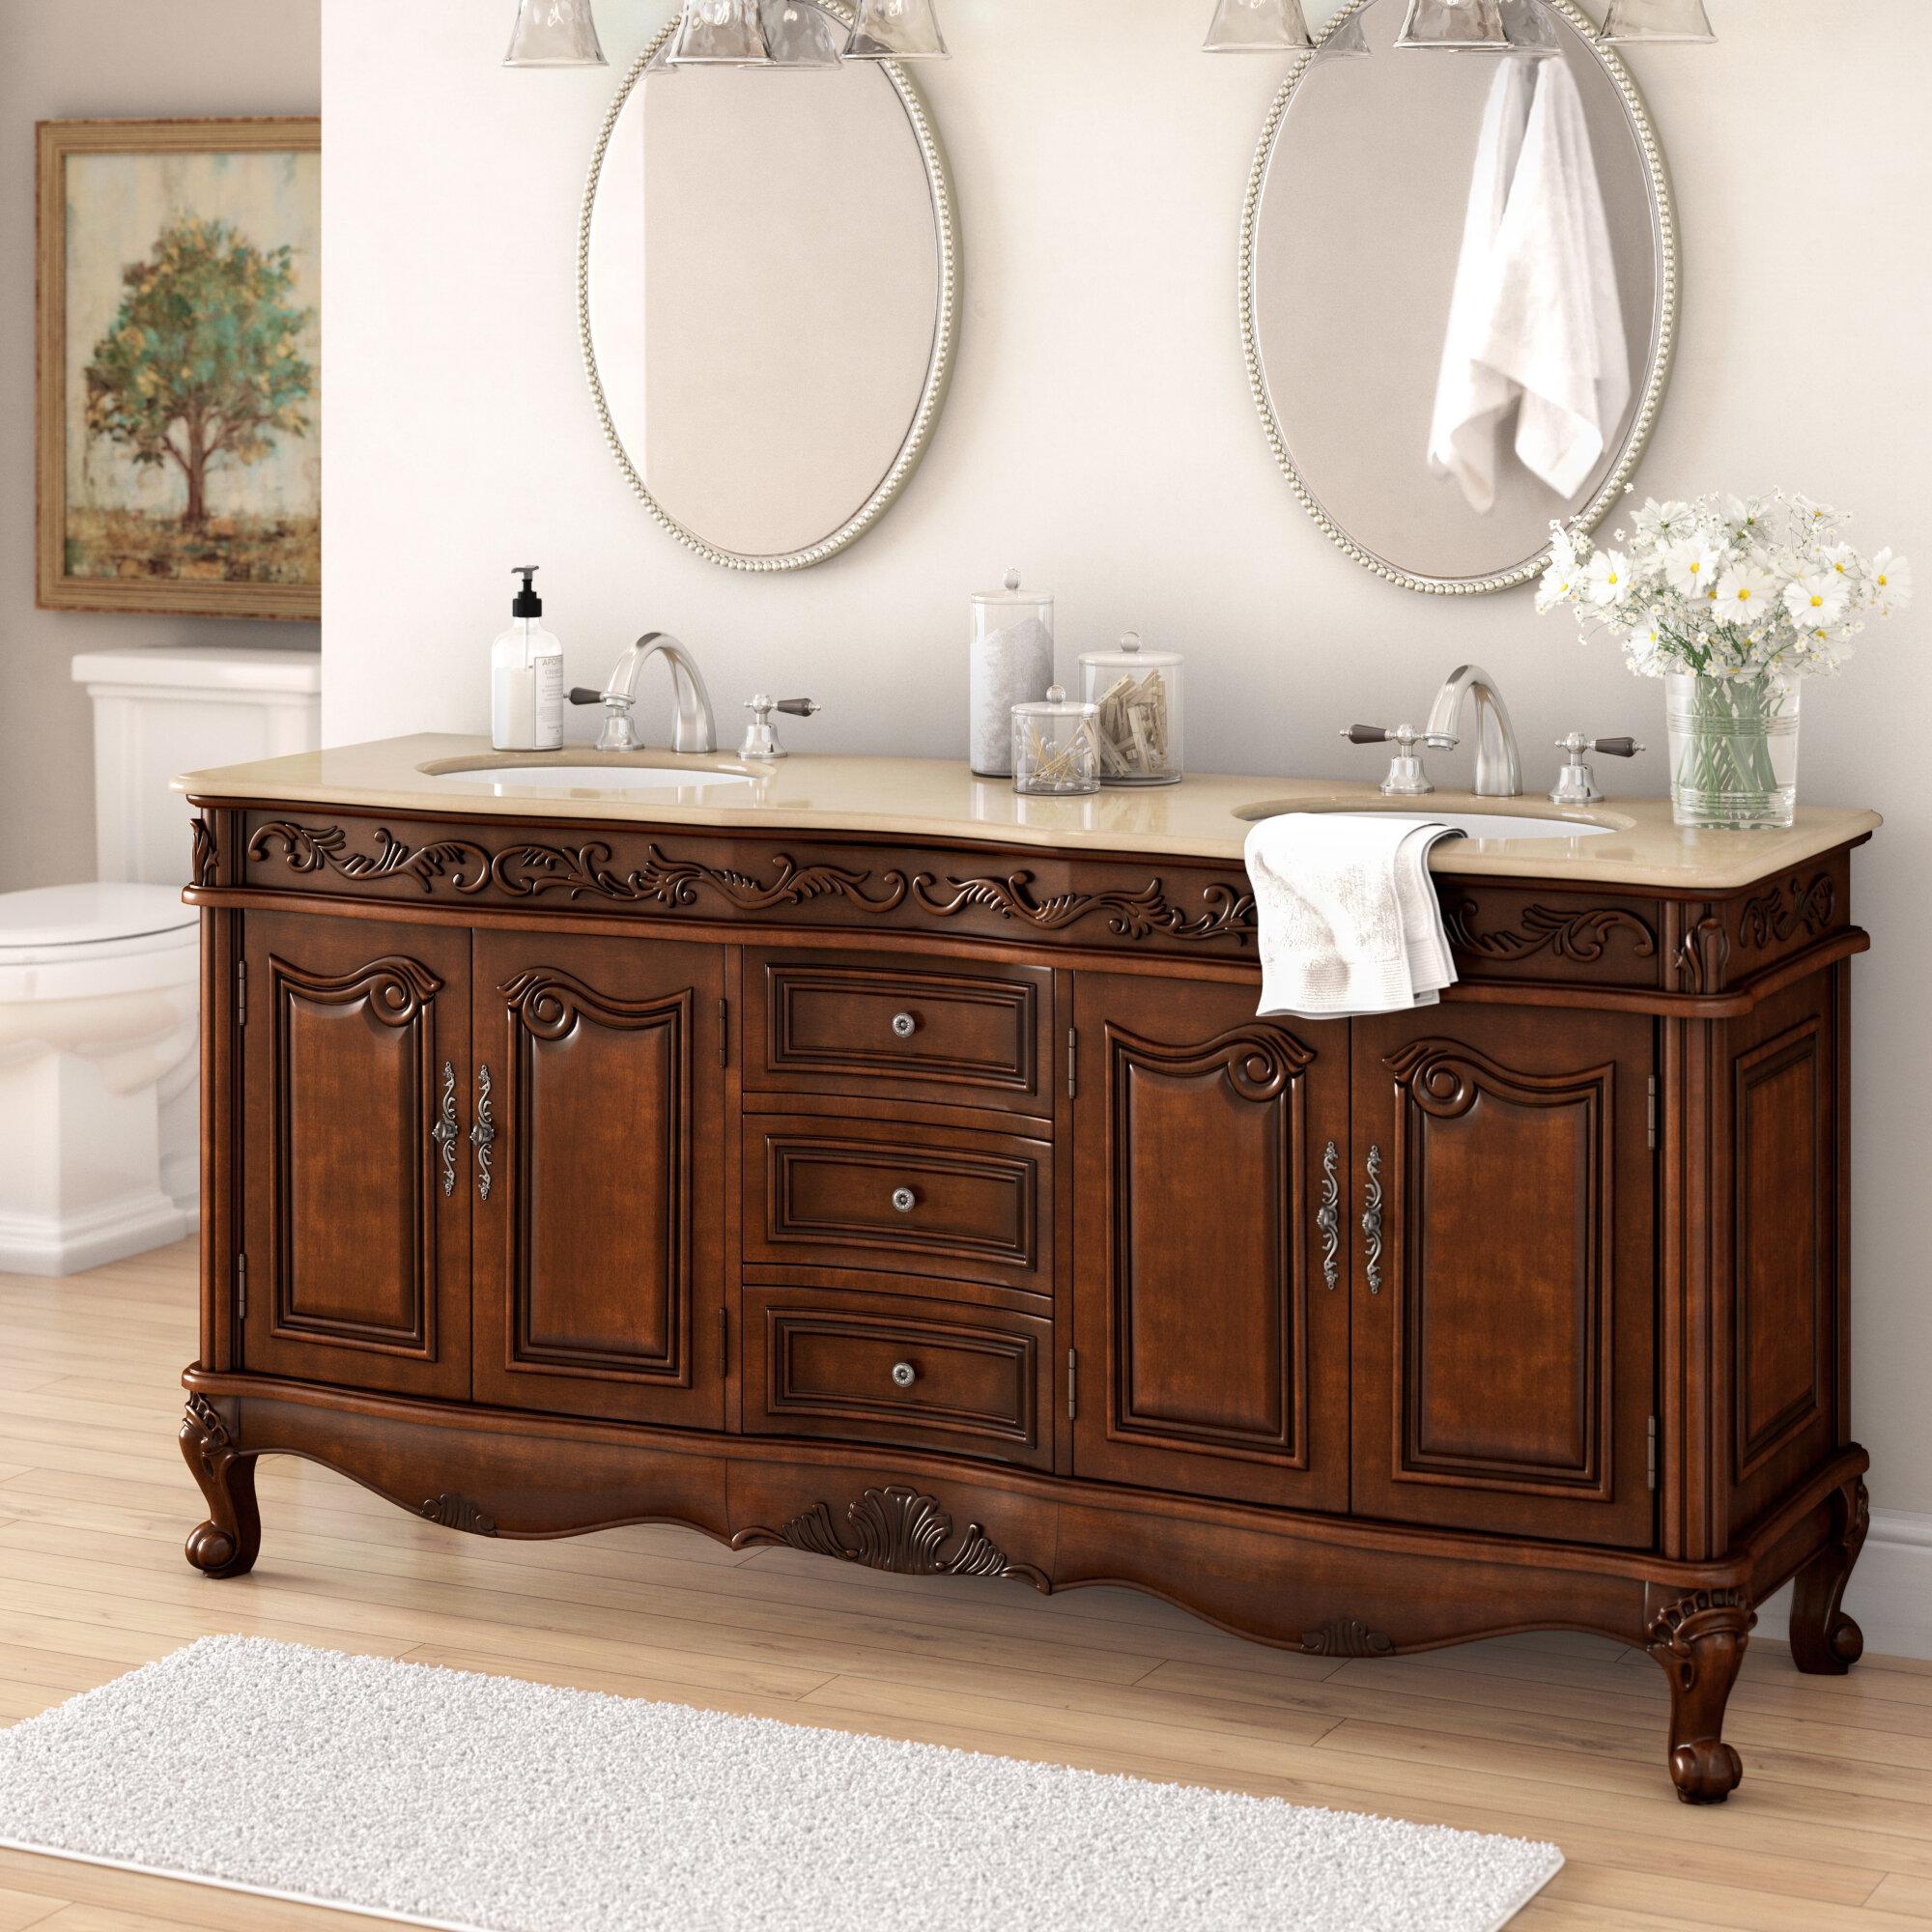 Astoria Grand Pillsbury 72 Double Bathroom Vanity Set Reviews Wayfair